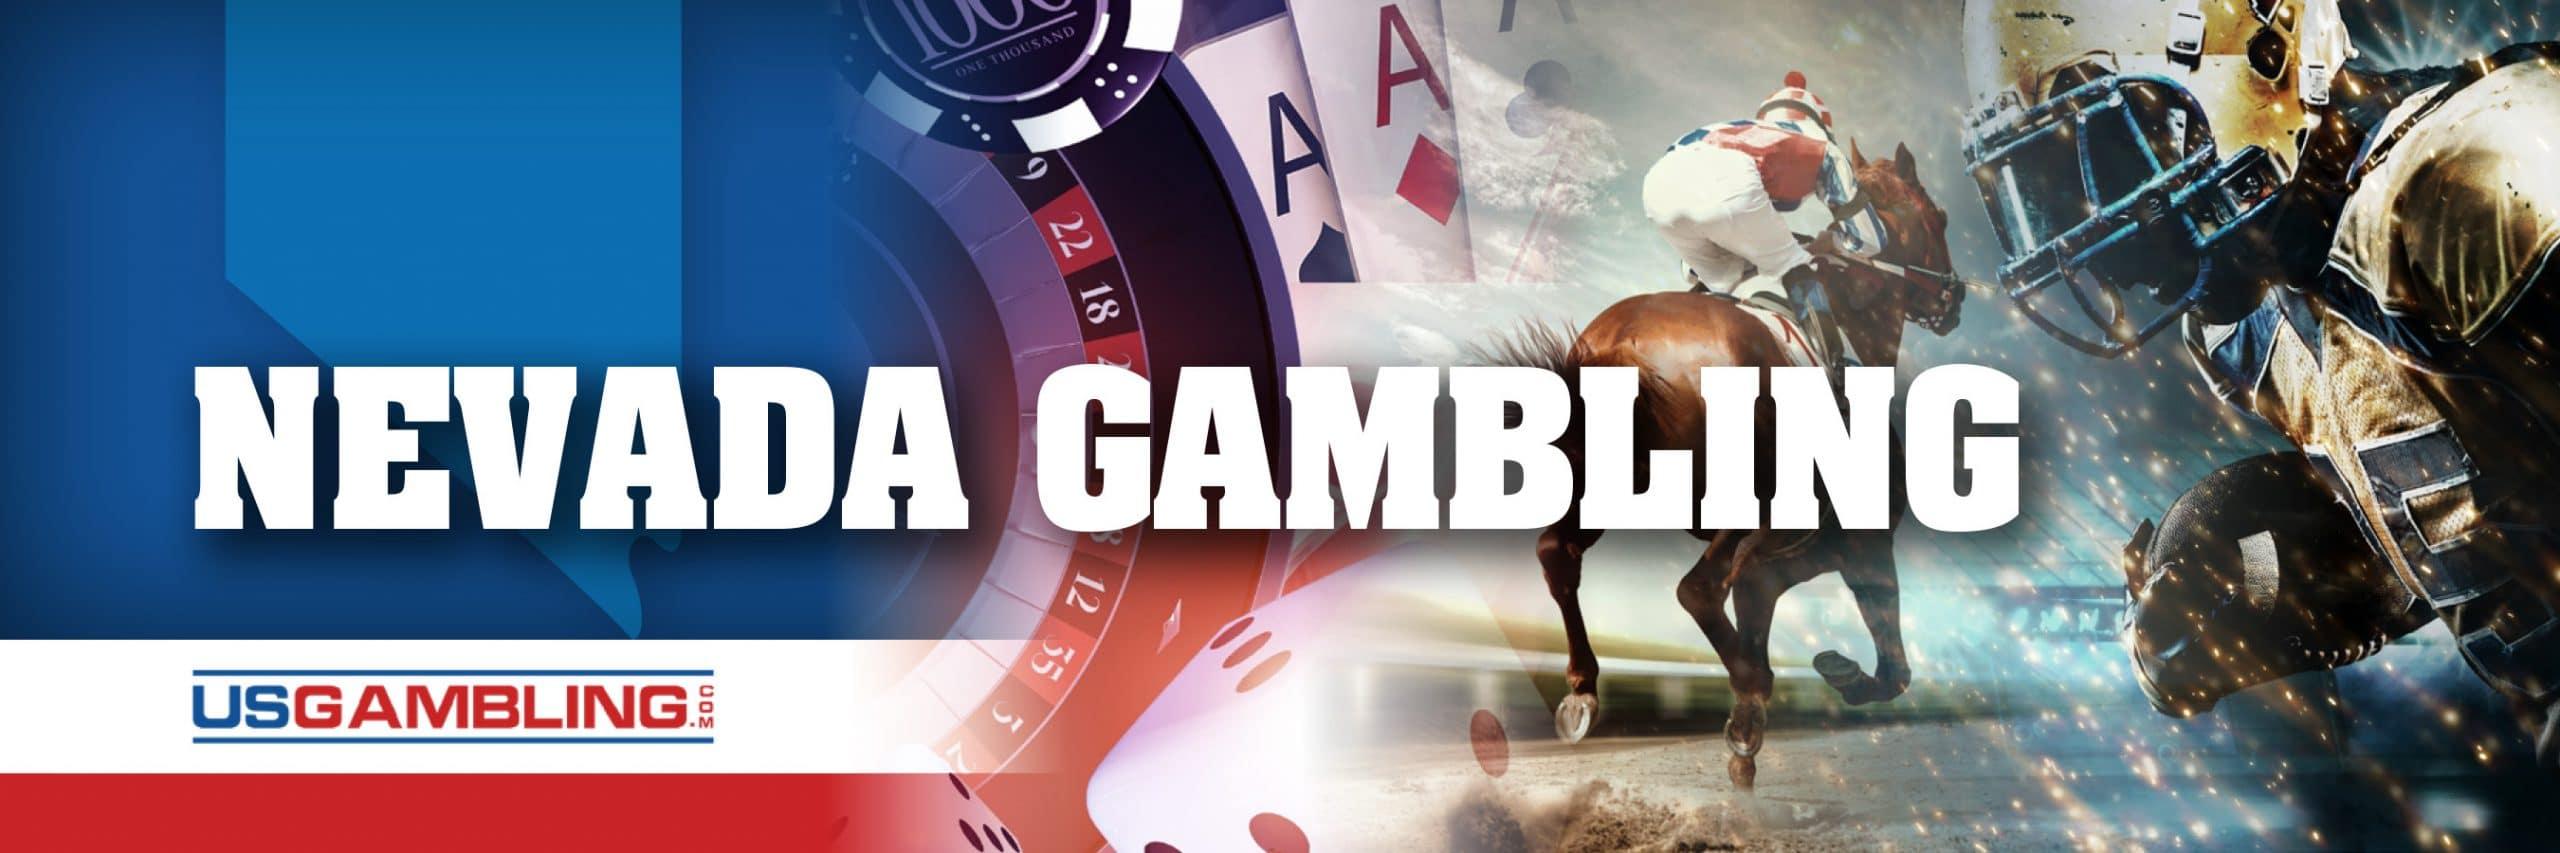 Legal Nevada Gambling